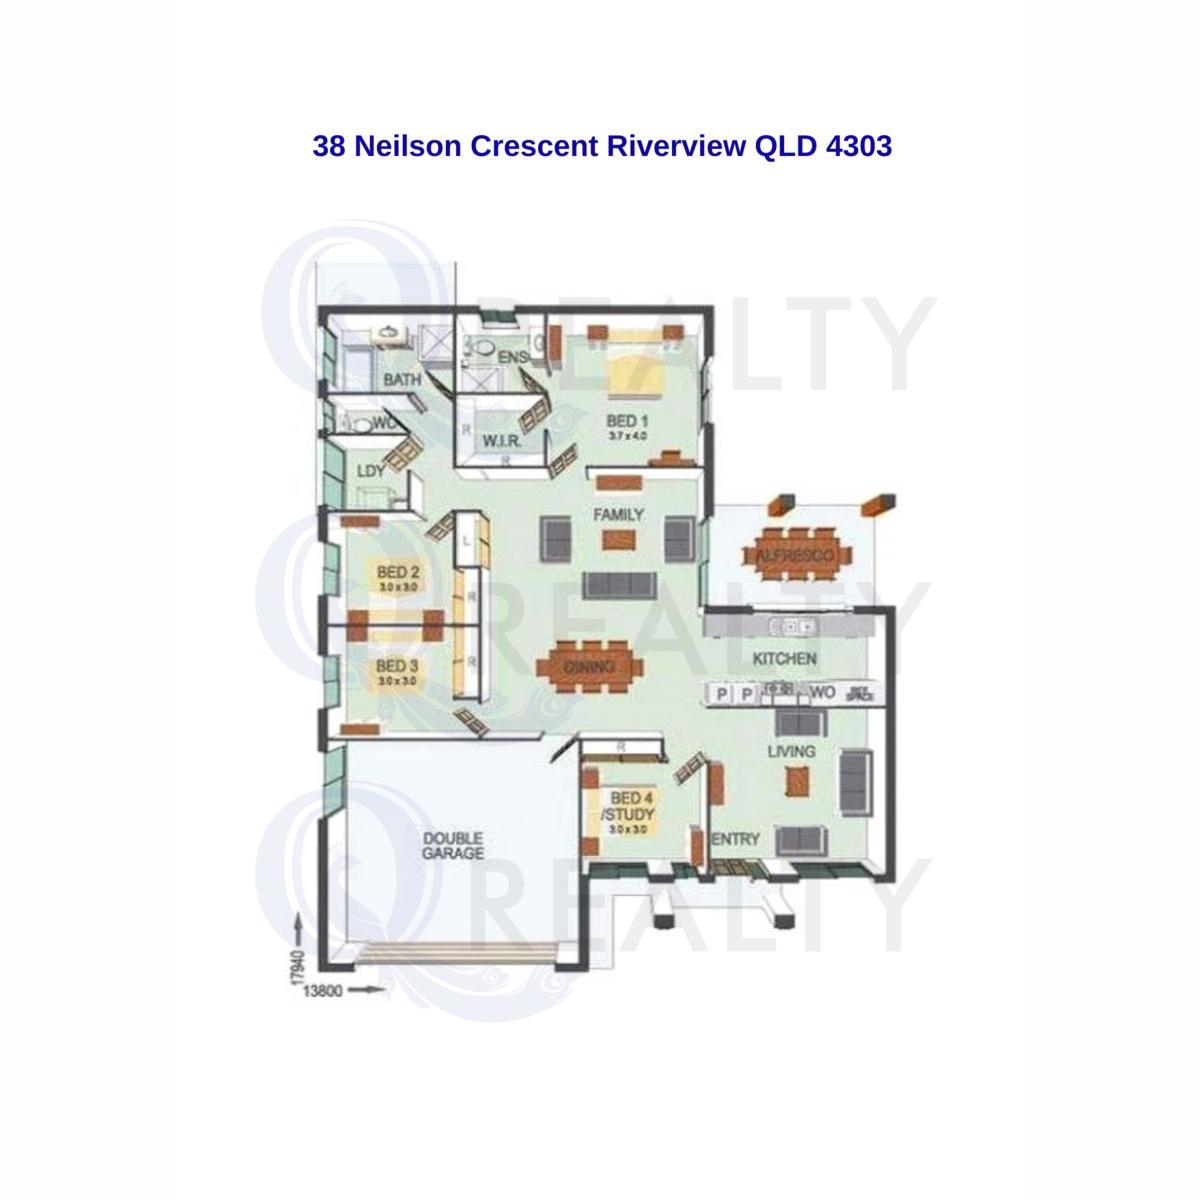 38. Neilson Crescent, Riverview  QLD  4303